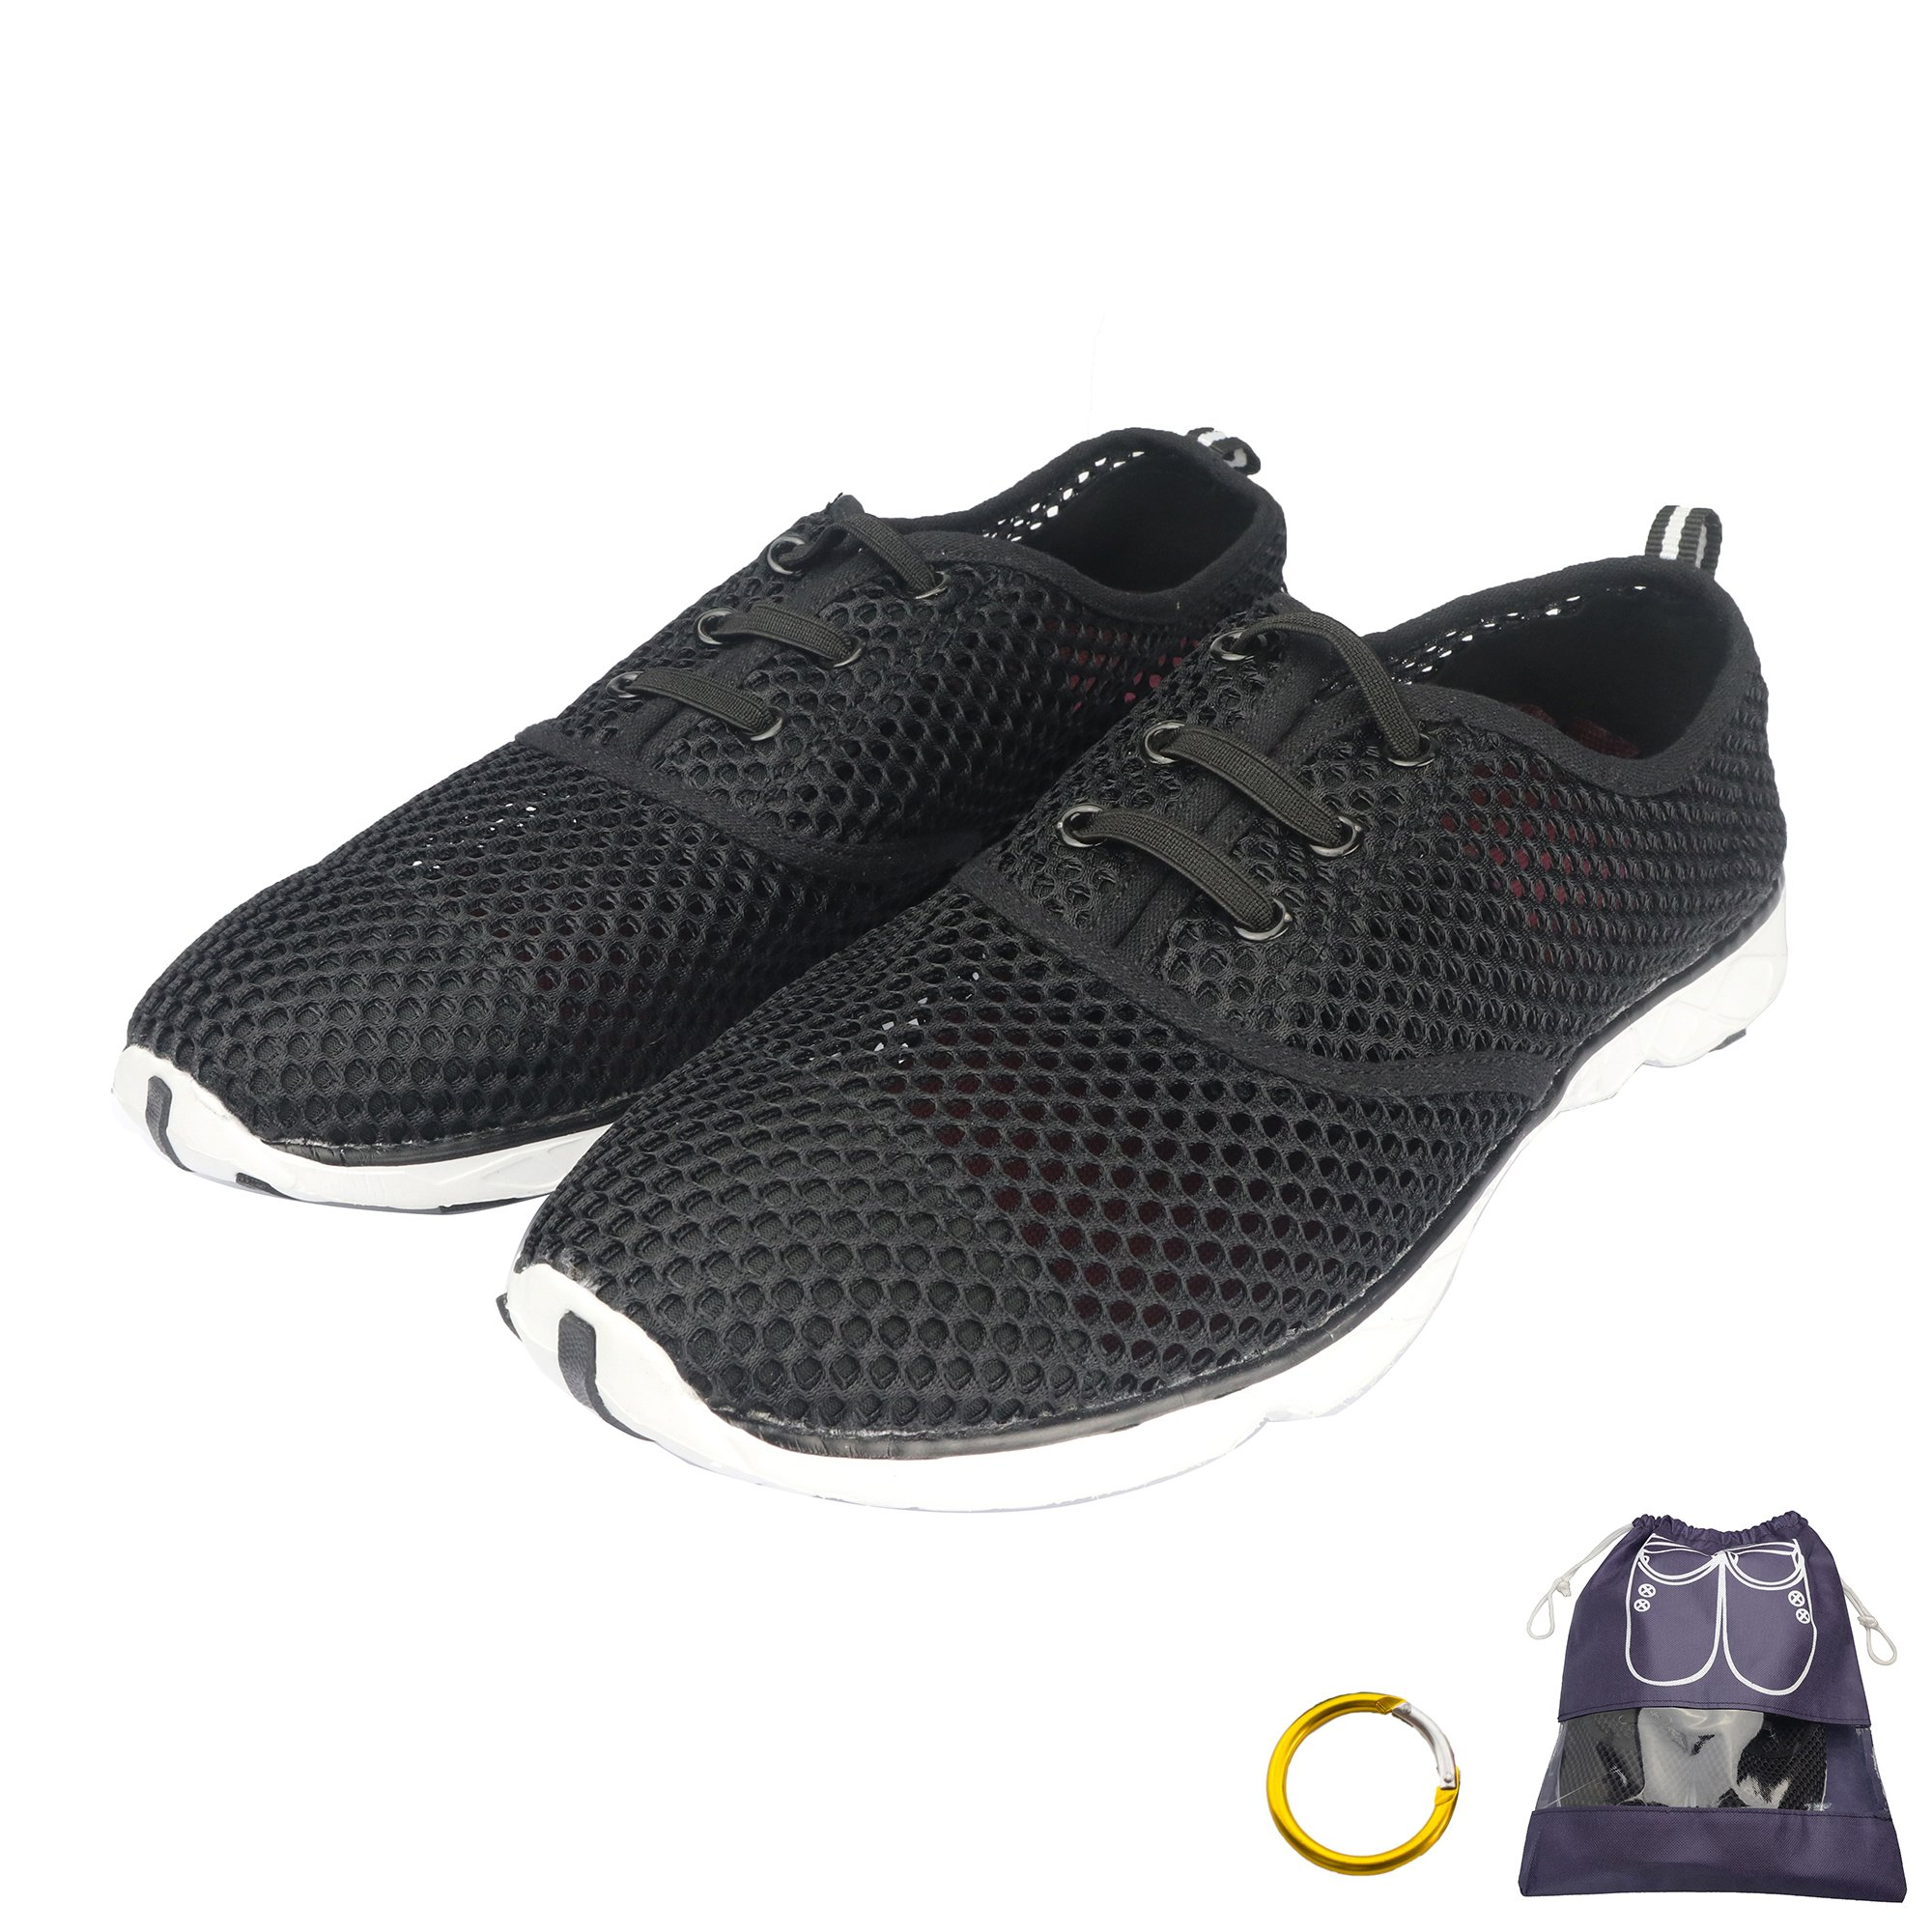 RAHATA Water Shoes Women Quick Dry Mesh Slip On Shoes With Storage Bag Carabiner, Black/10 B(M) Us Women/8 D(M) Us Men